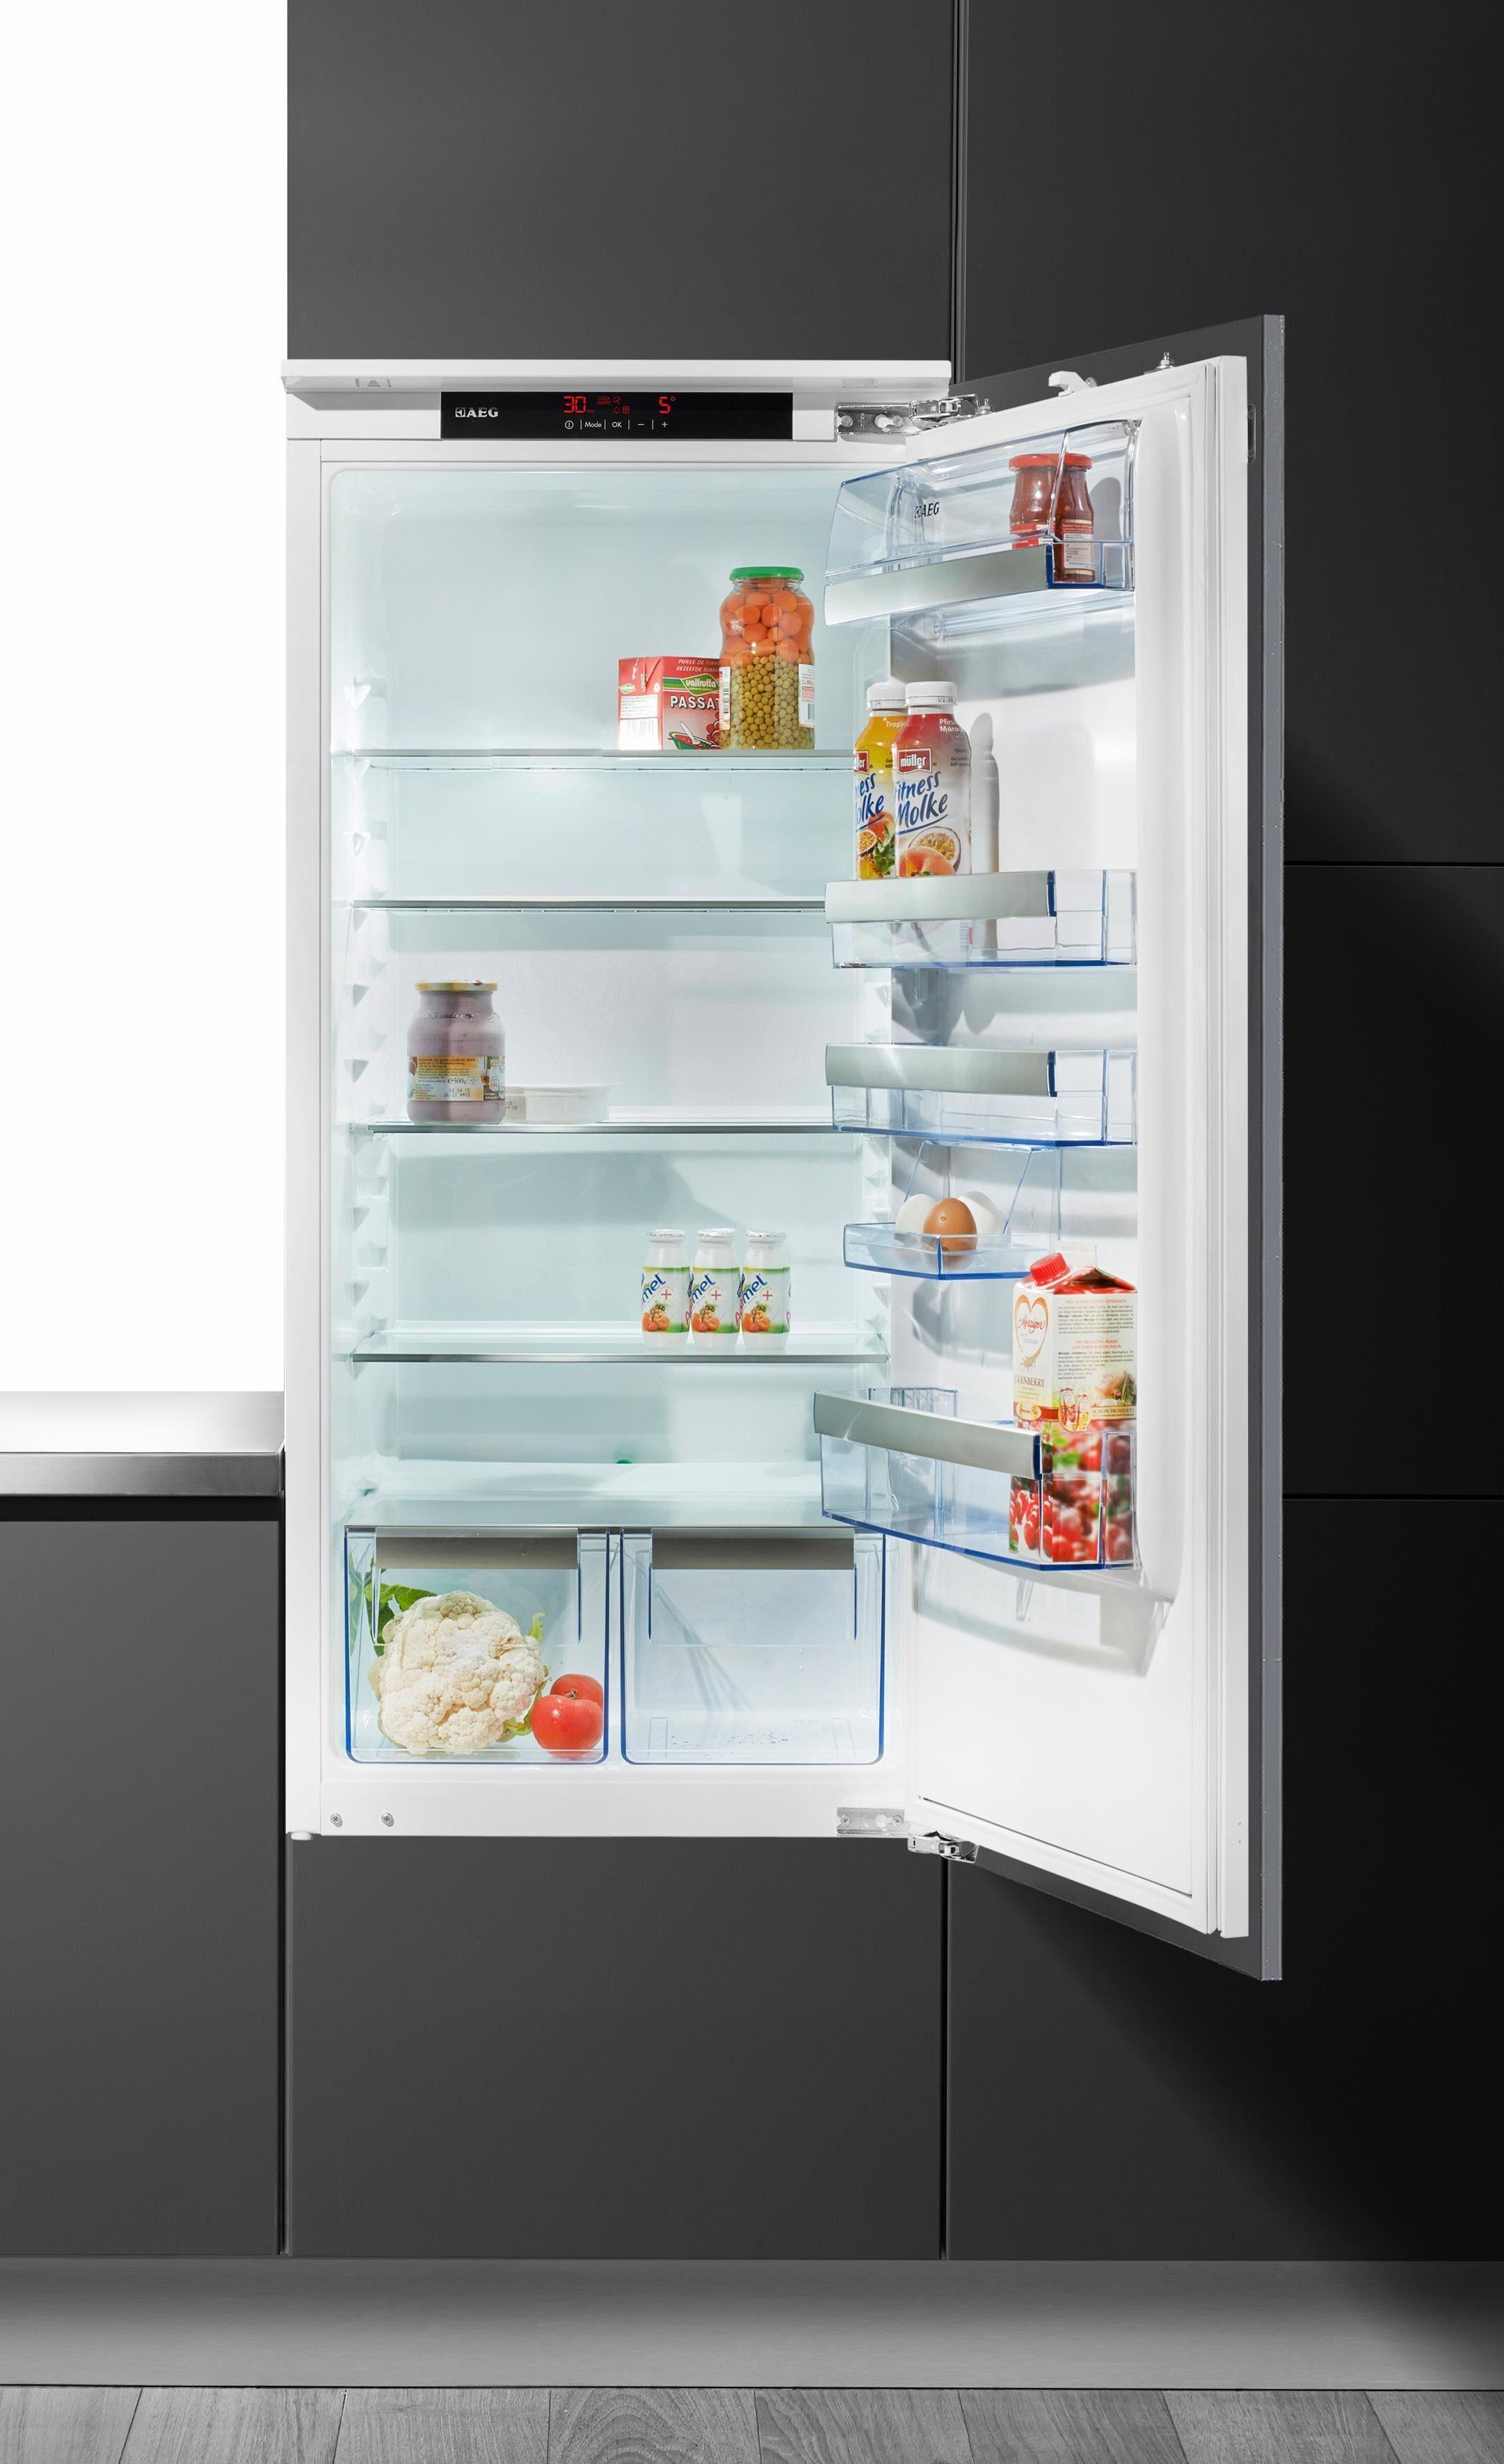 AEG integrierbarer Einbaukühlschrank SANTO SKS91200F1, A+++, 121,9 cm